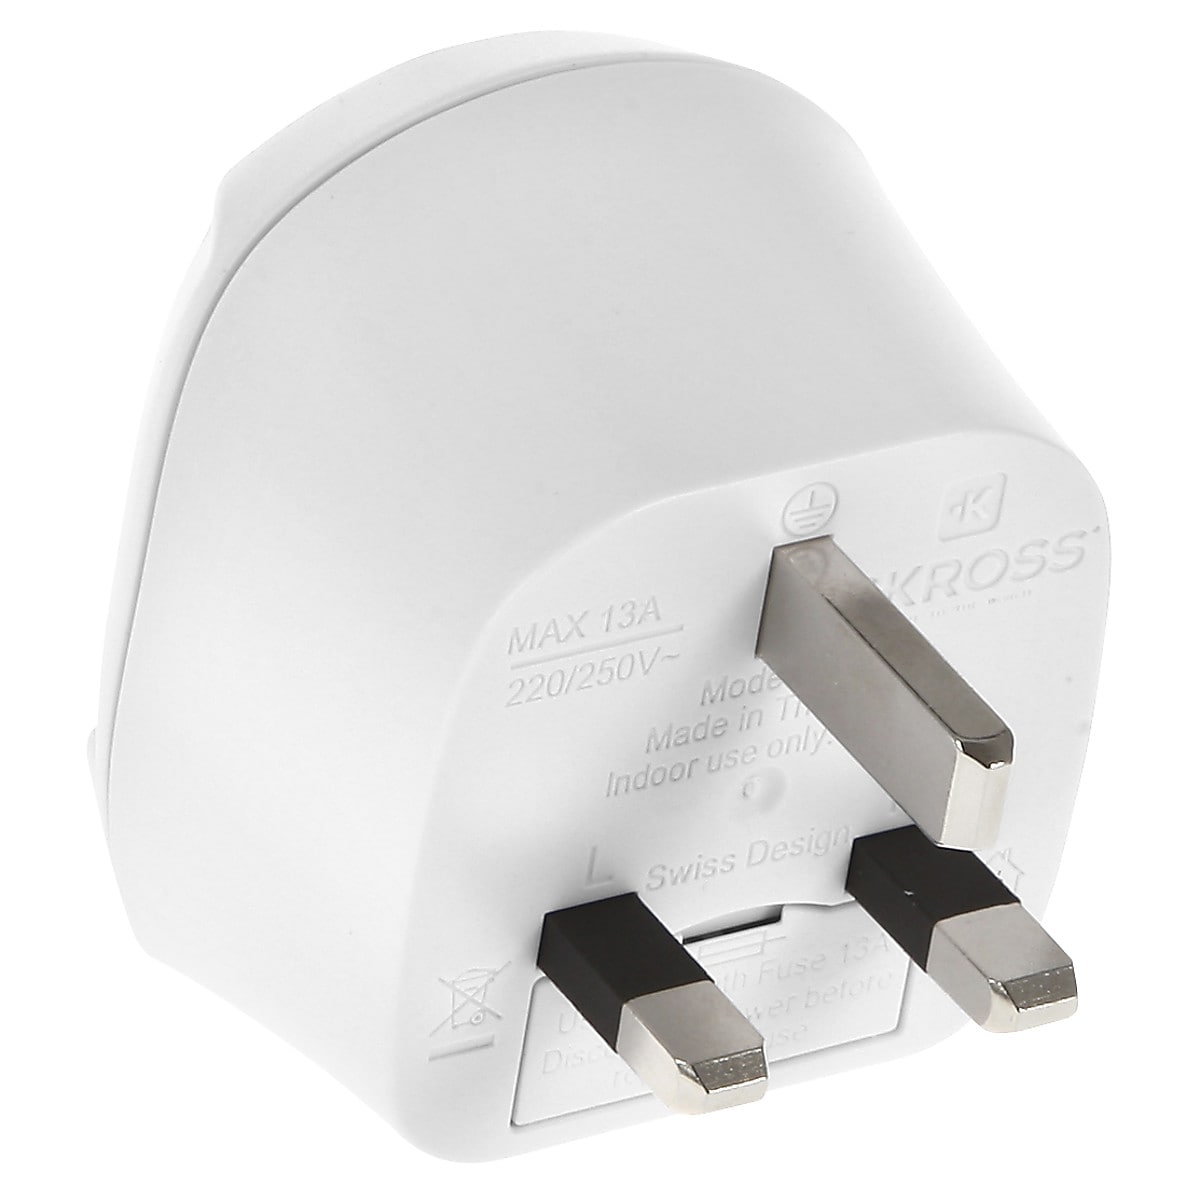 SKROSS Europe to UK Travel Adaptor Plug